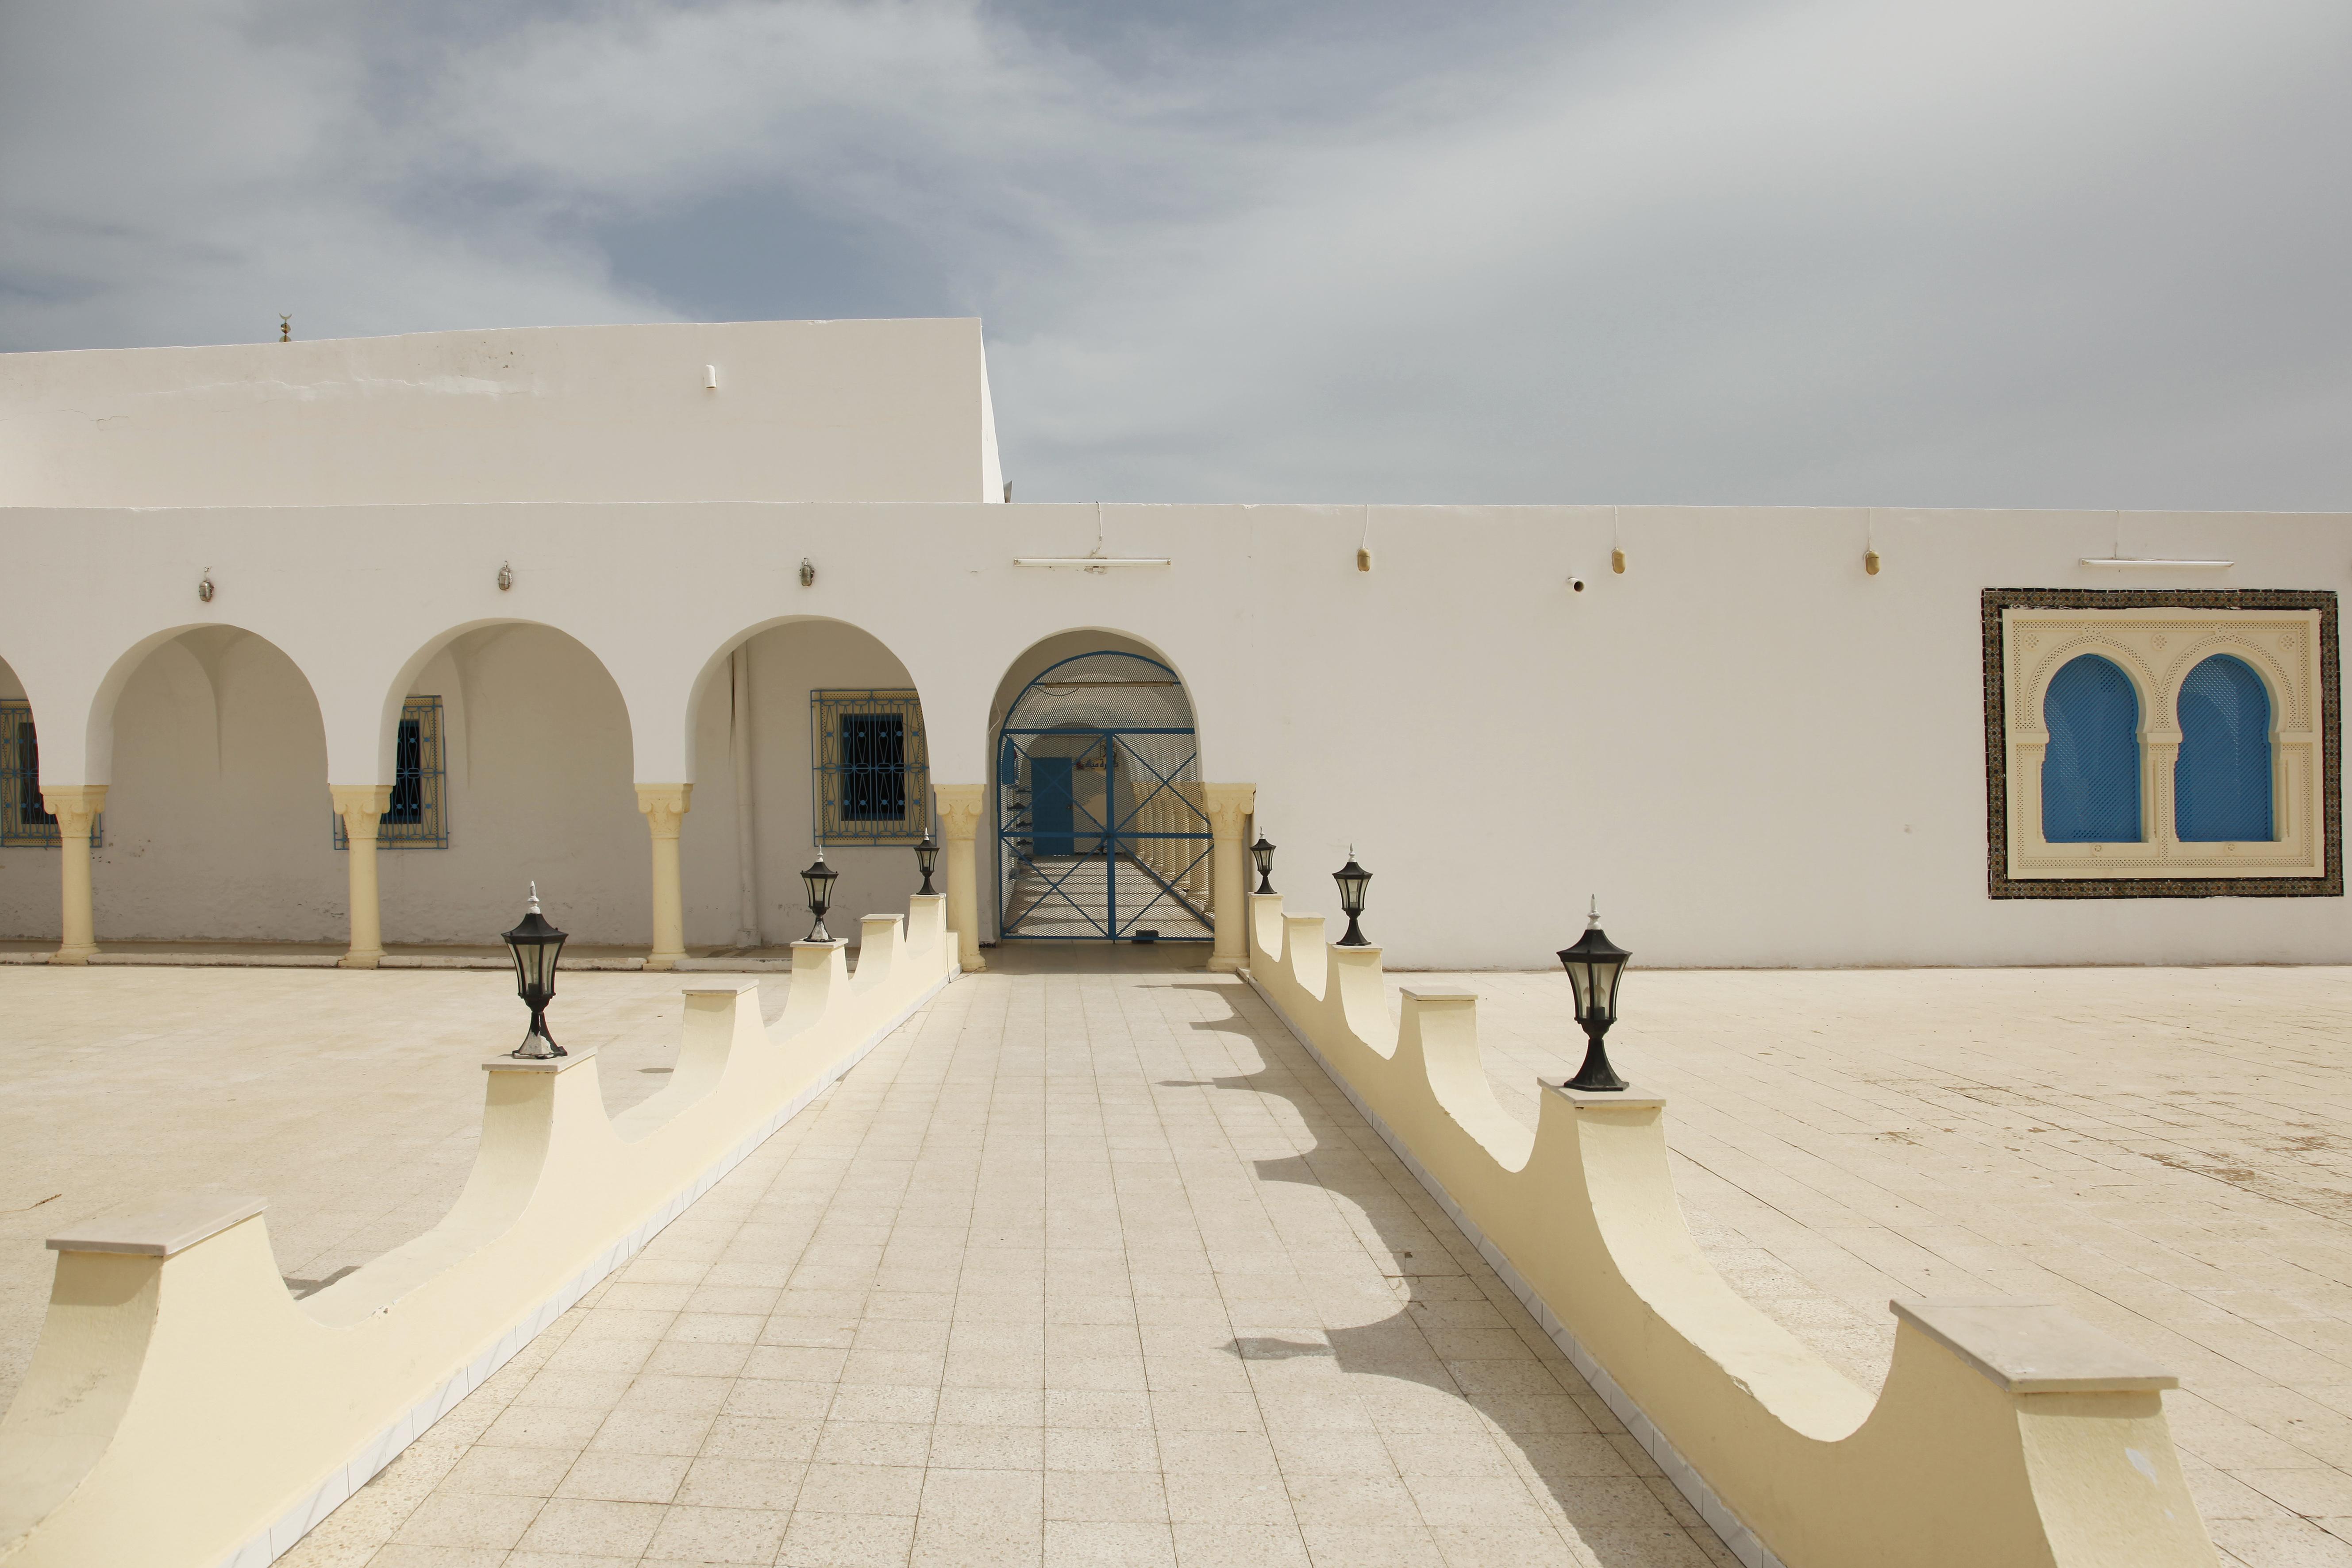 Двор мечети. Зарзис, Тунис.